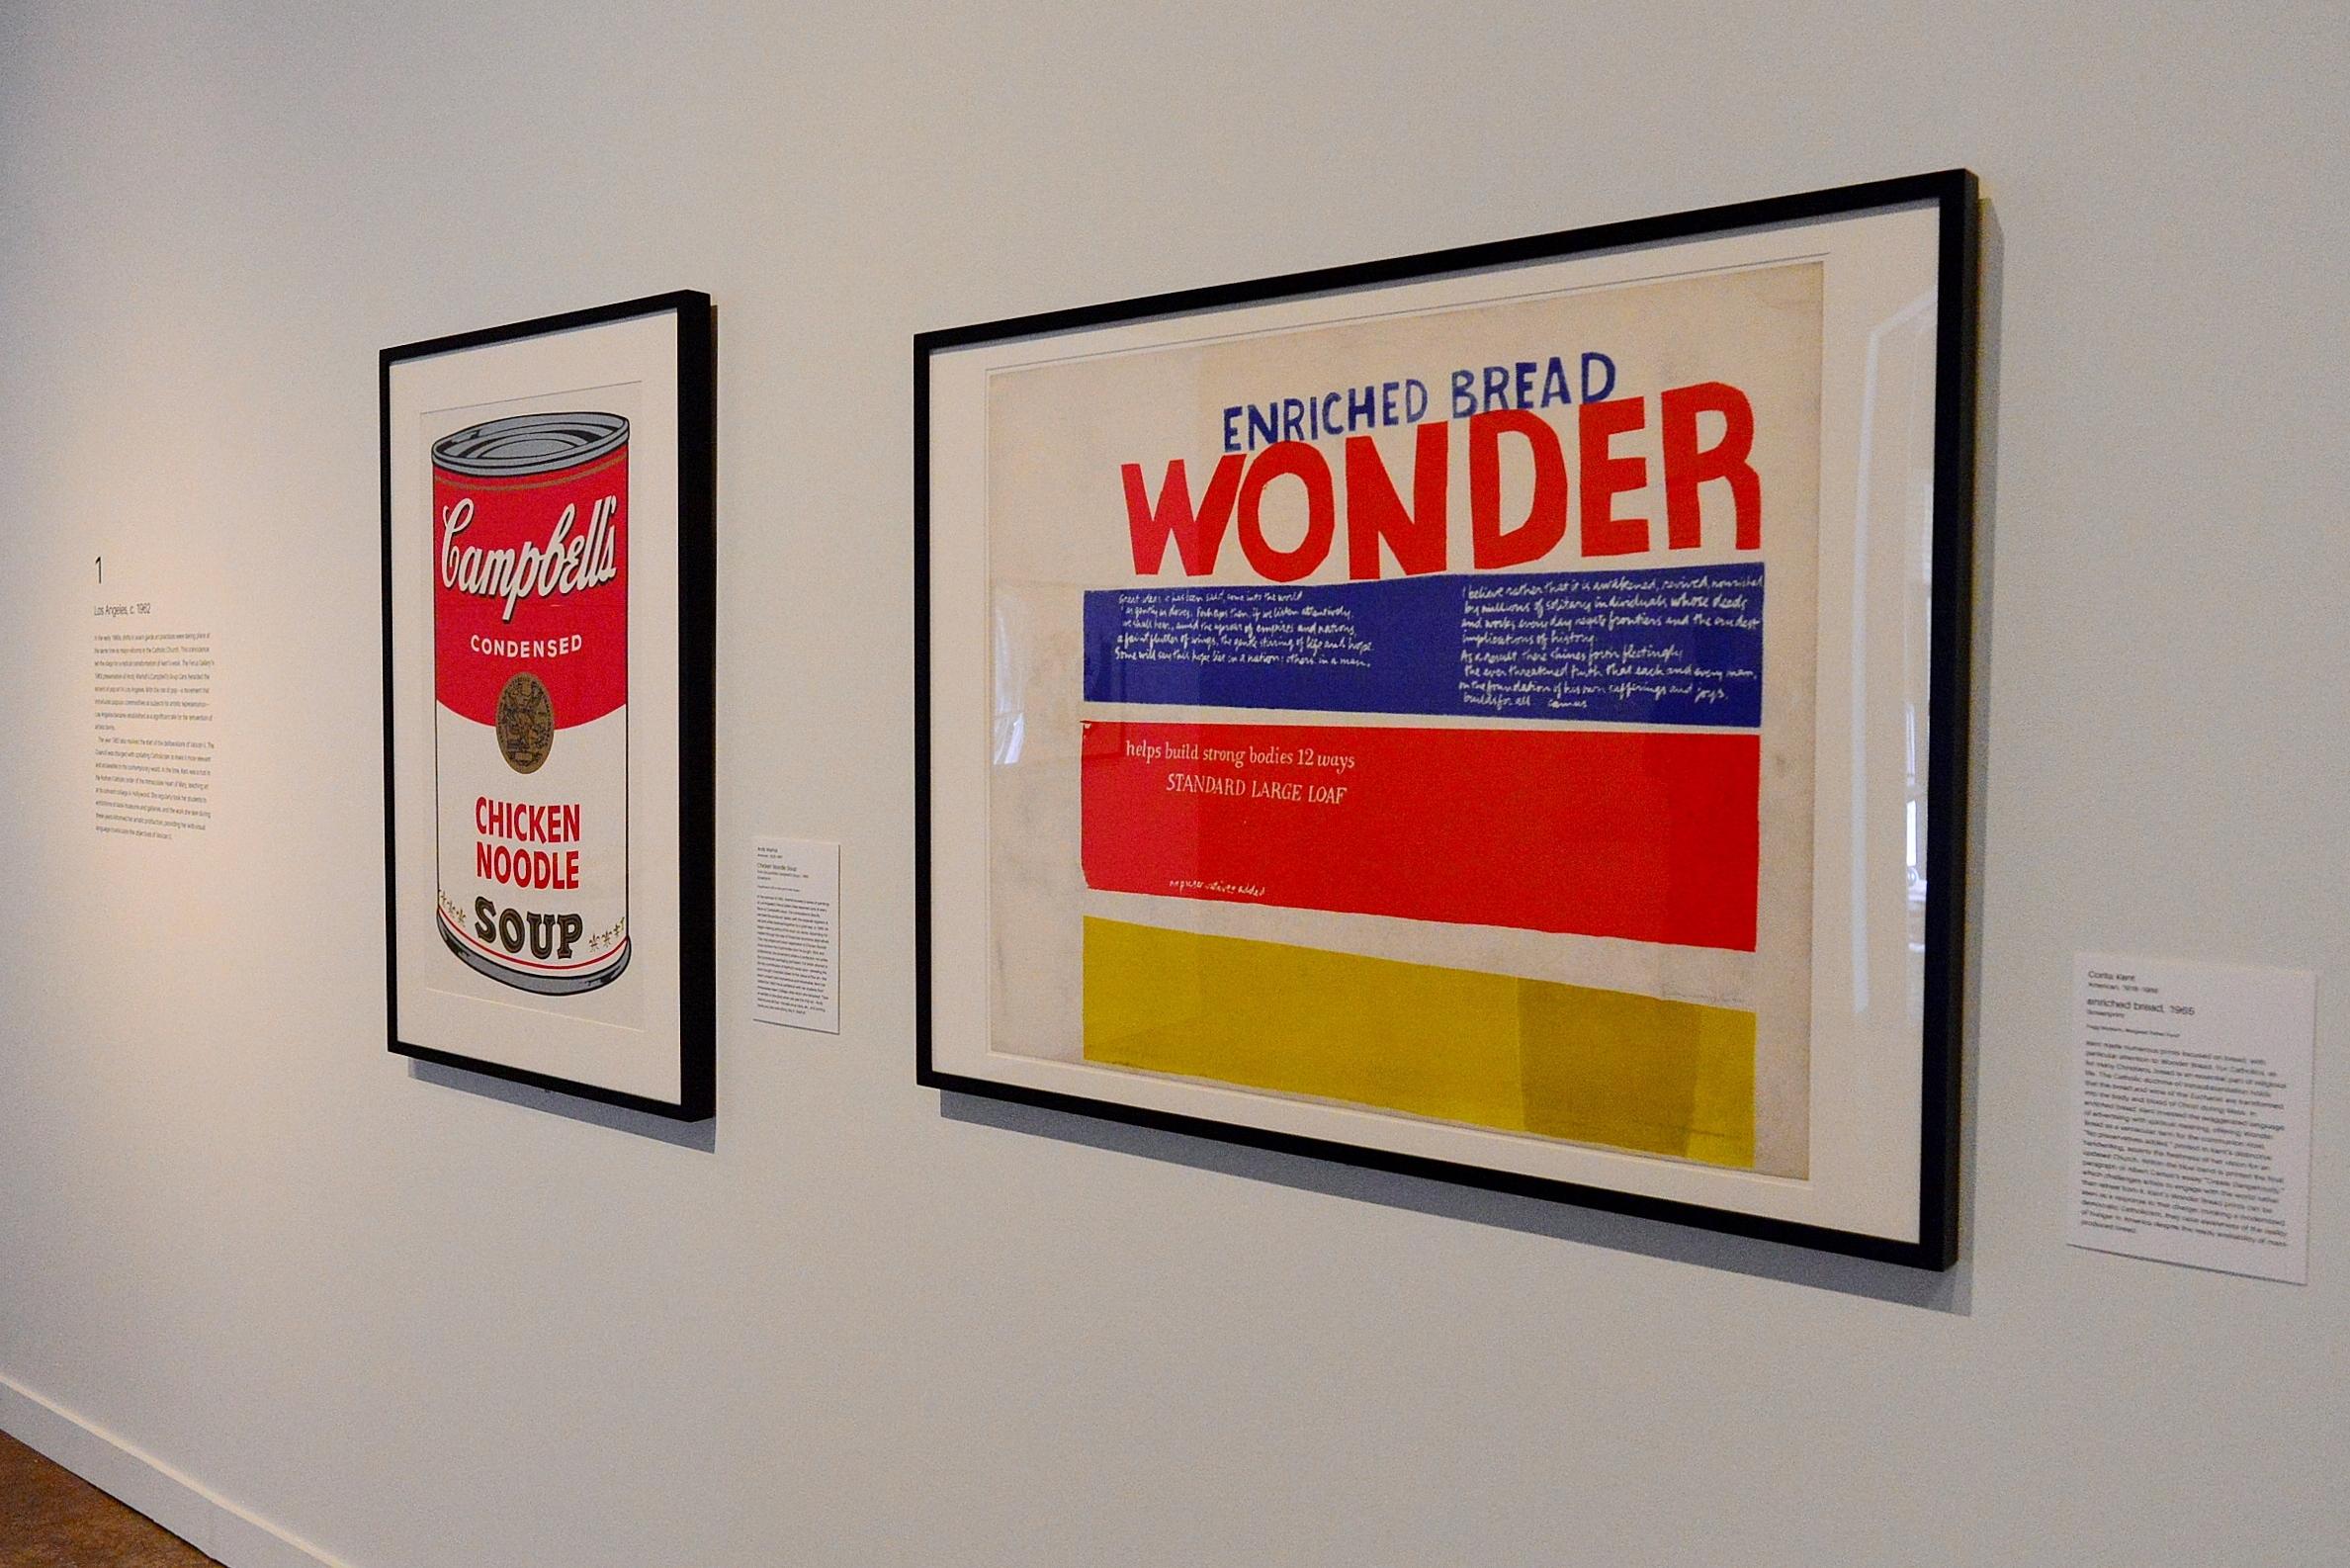 Warhol's Chicken Noodle Soup alongside Kent's enriched bread.